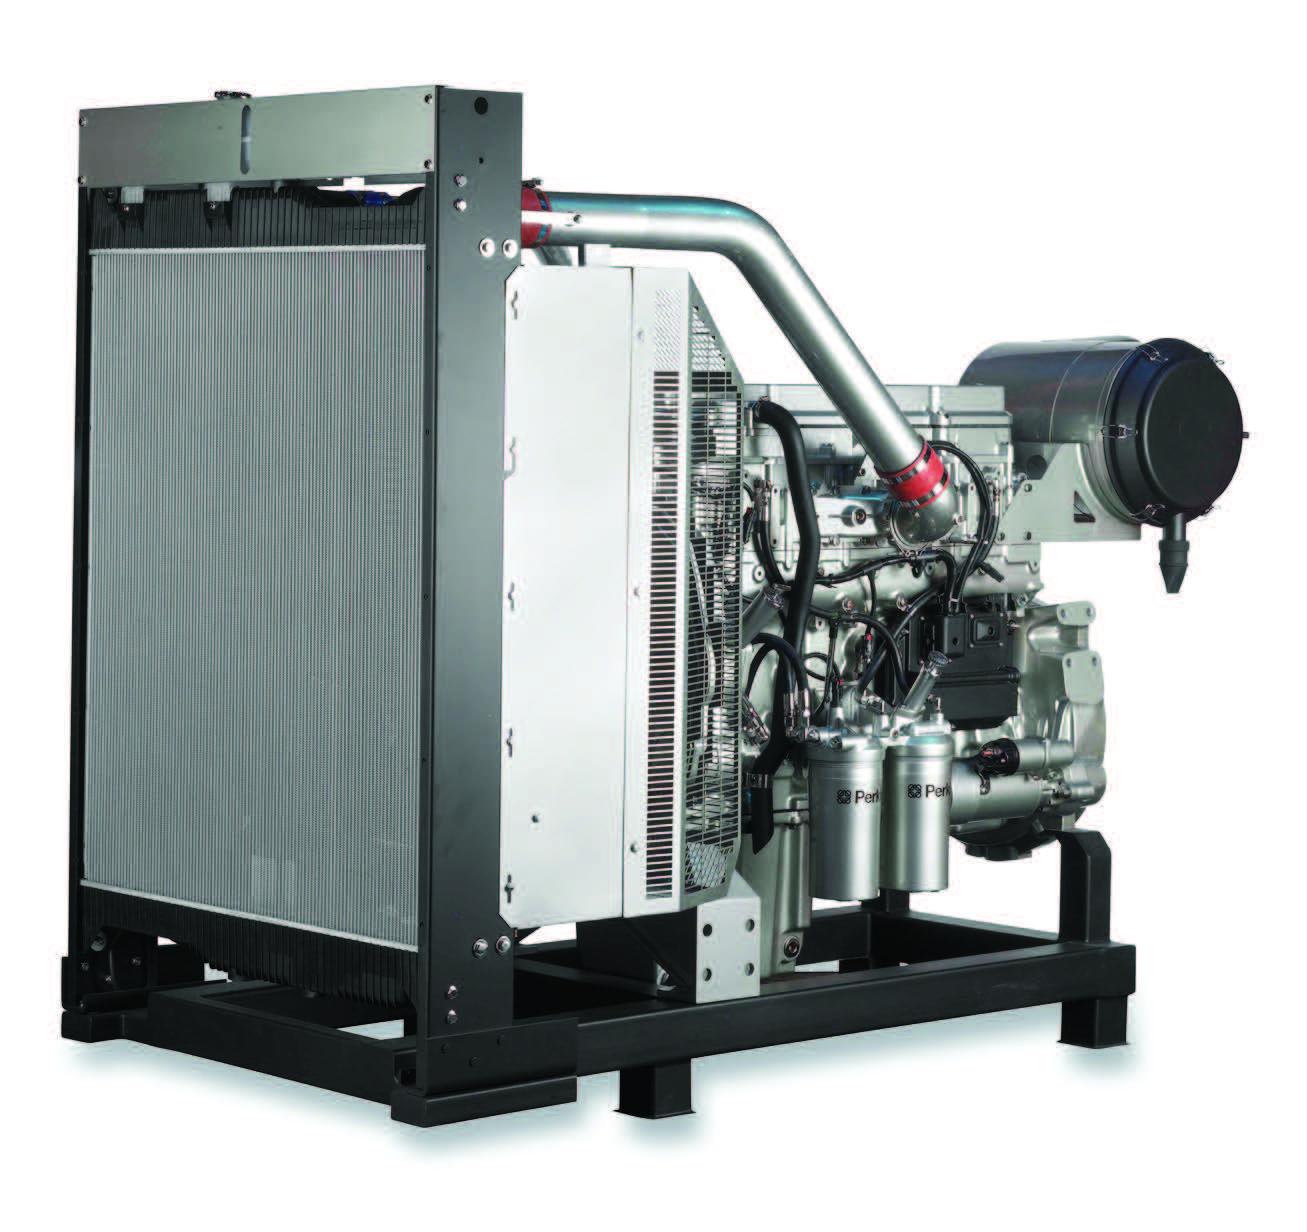 2206A-E13TAG2 Diesel Engine – ElectropaK